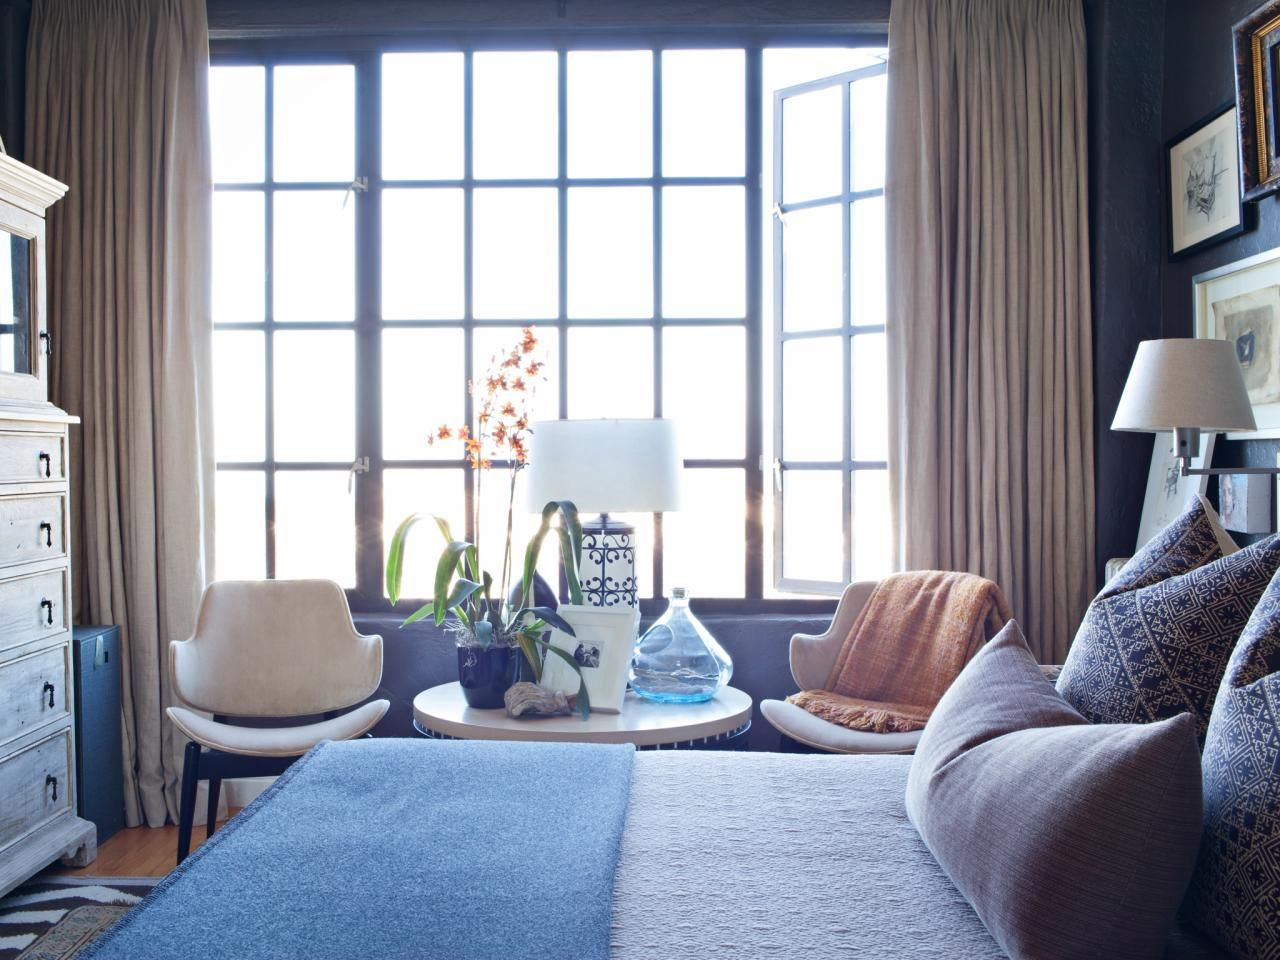 Interior designer creates a chic bedroom living